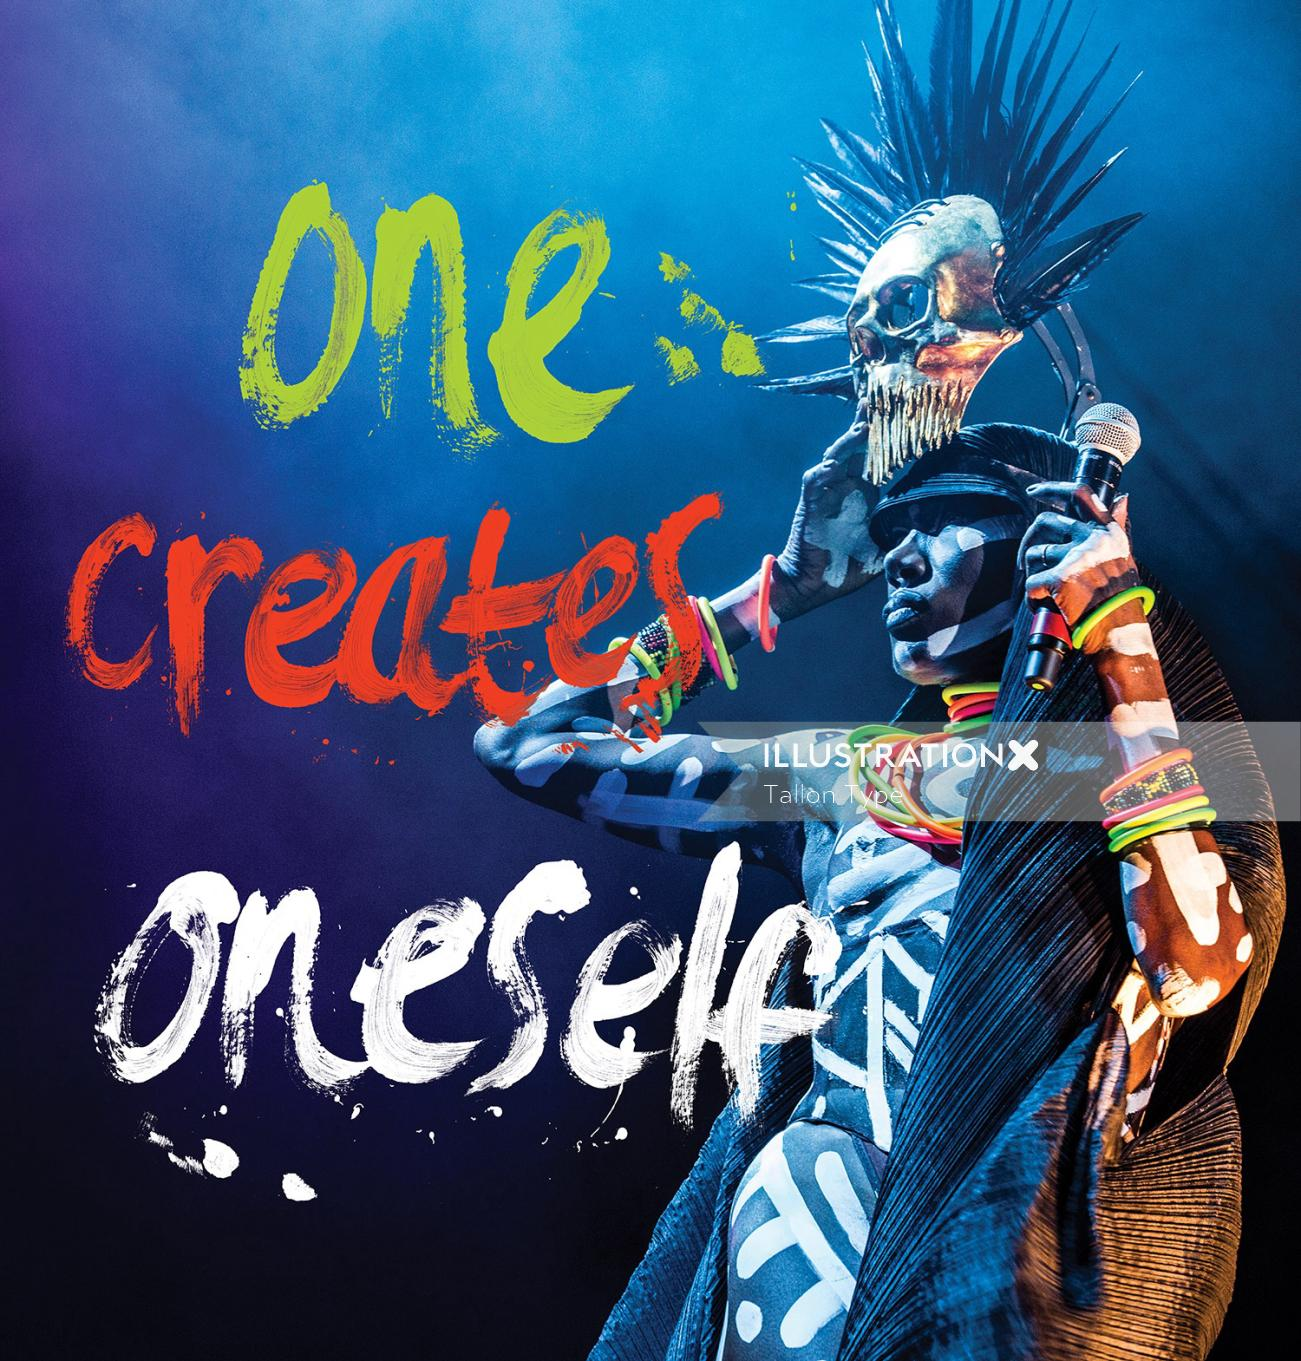 Once creates one self